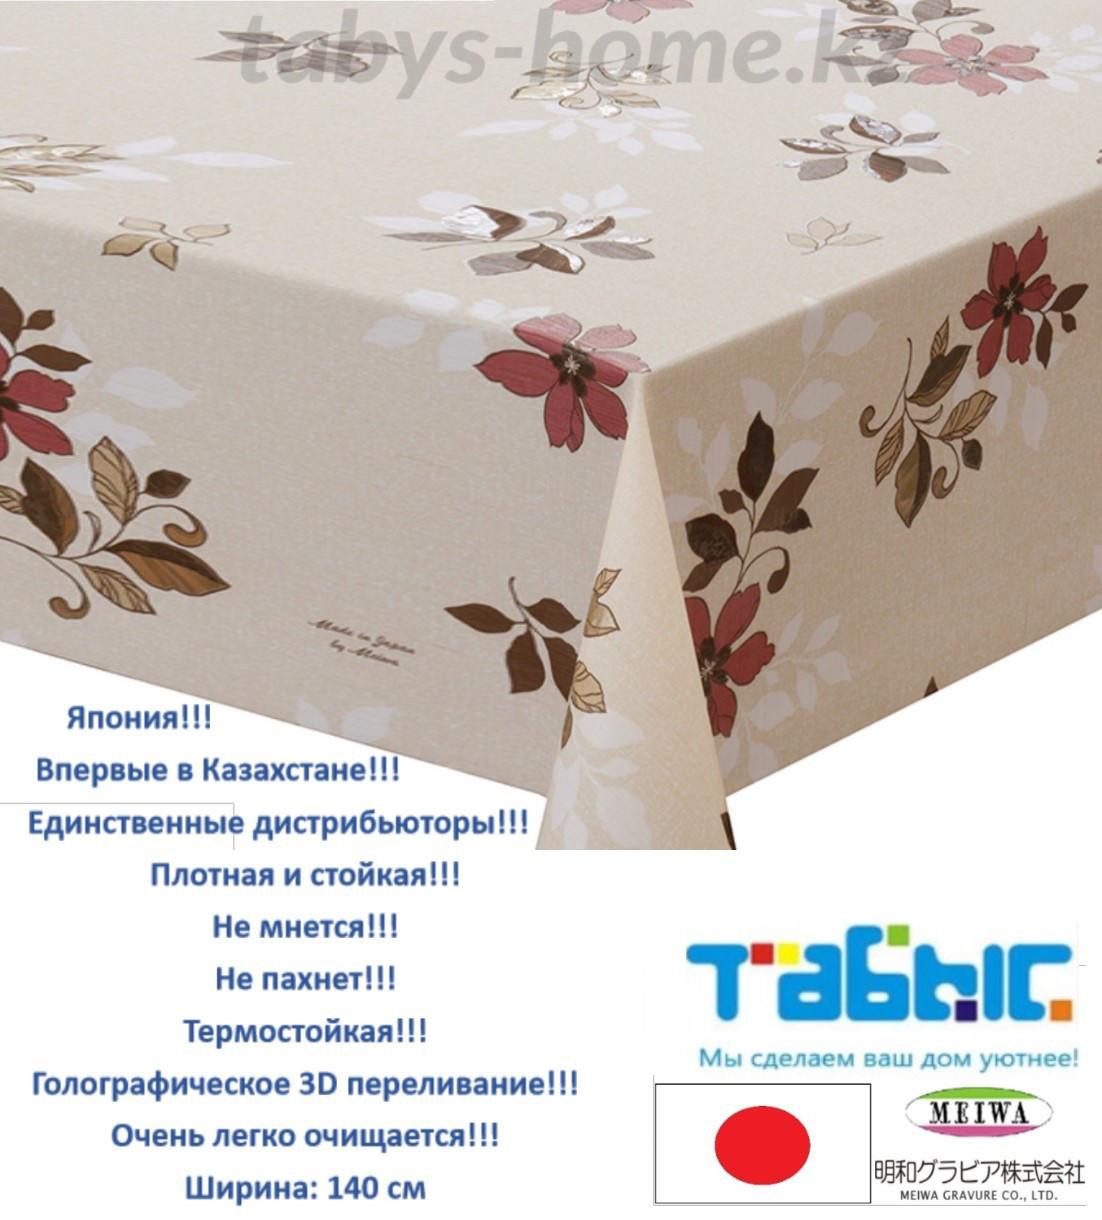 "Скатерть-клеенка20 м ""MEIWA"" LP-241 RE 140 см"